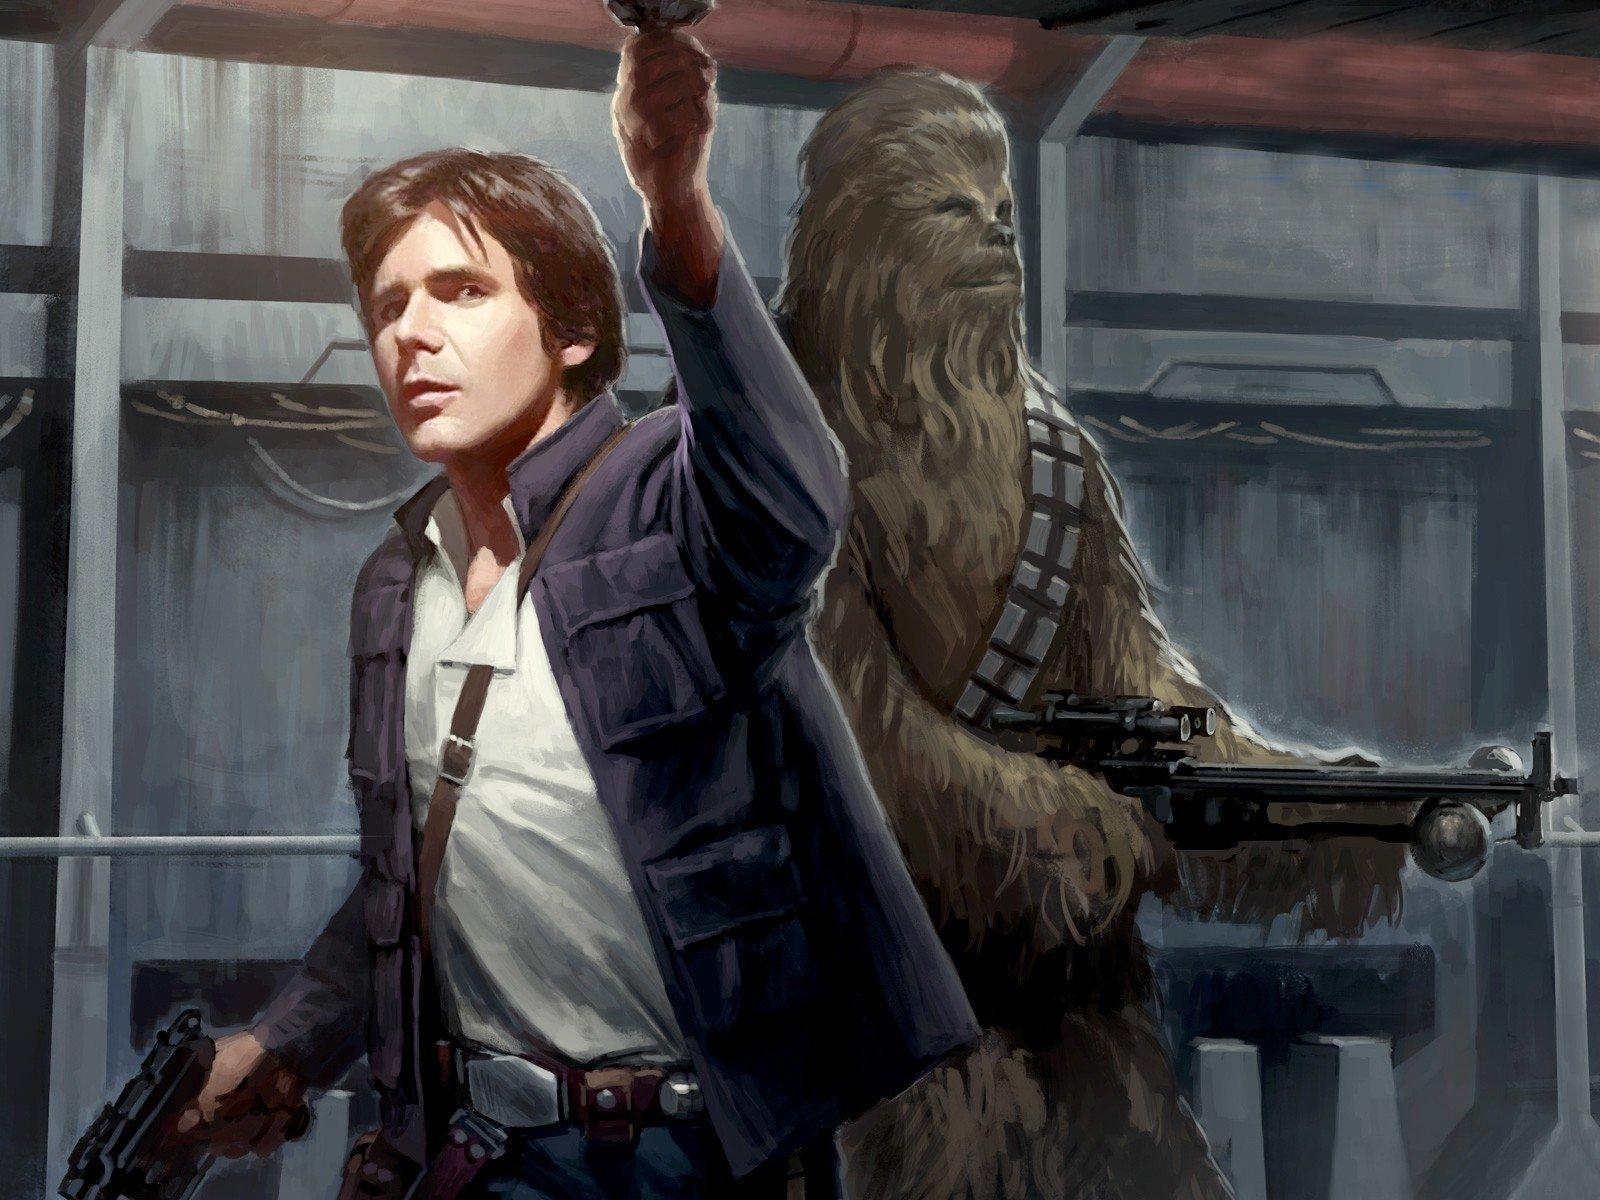 Han Solo Wallpapers Hd For Desktop Backgrounds